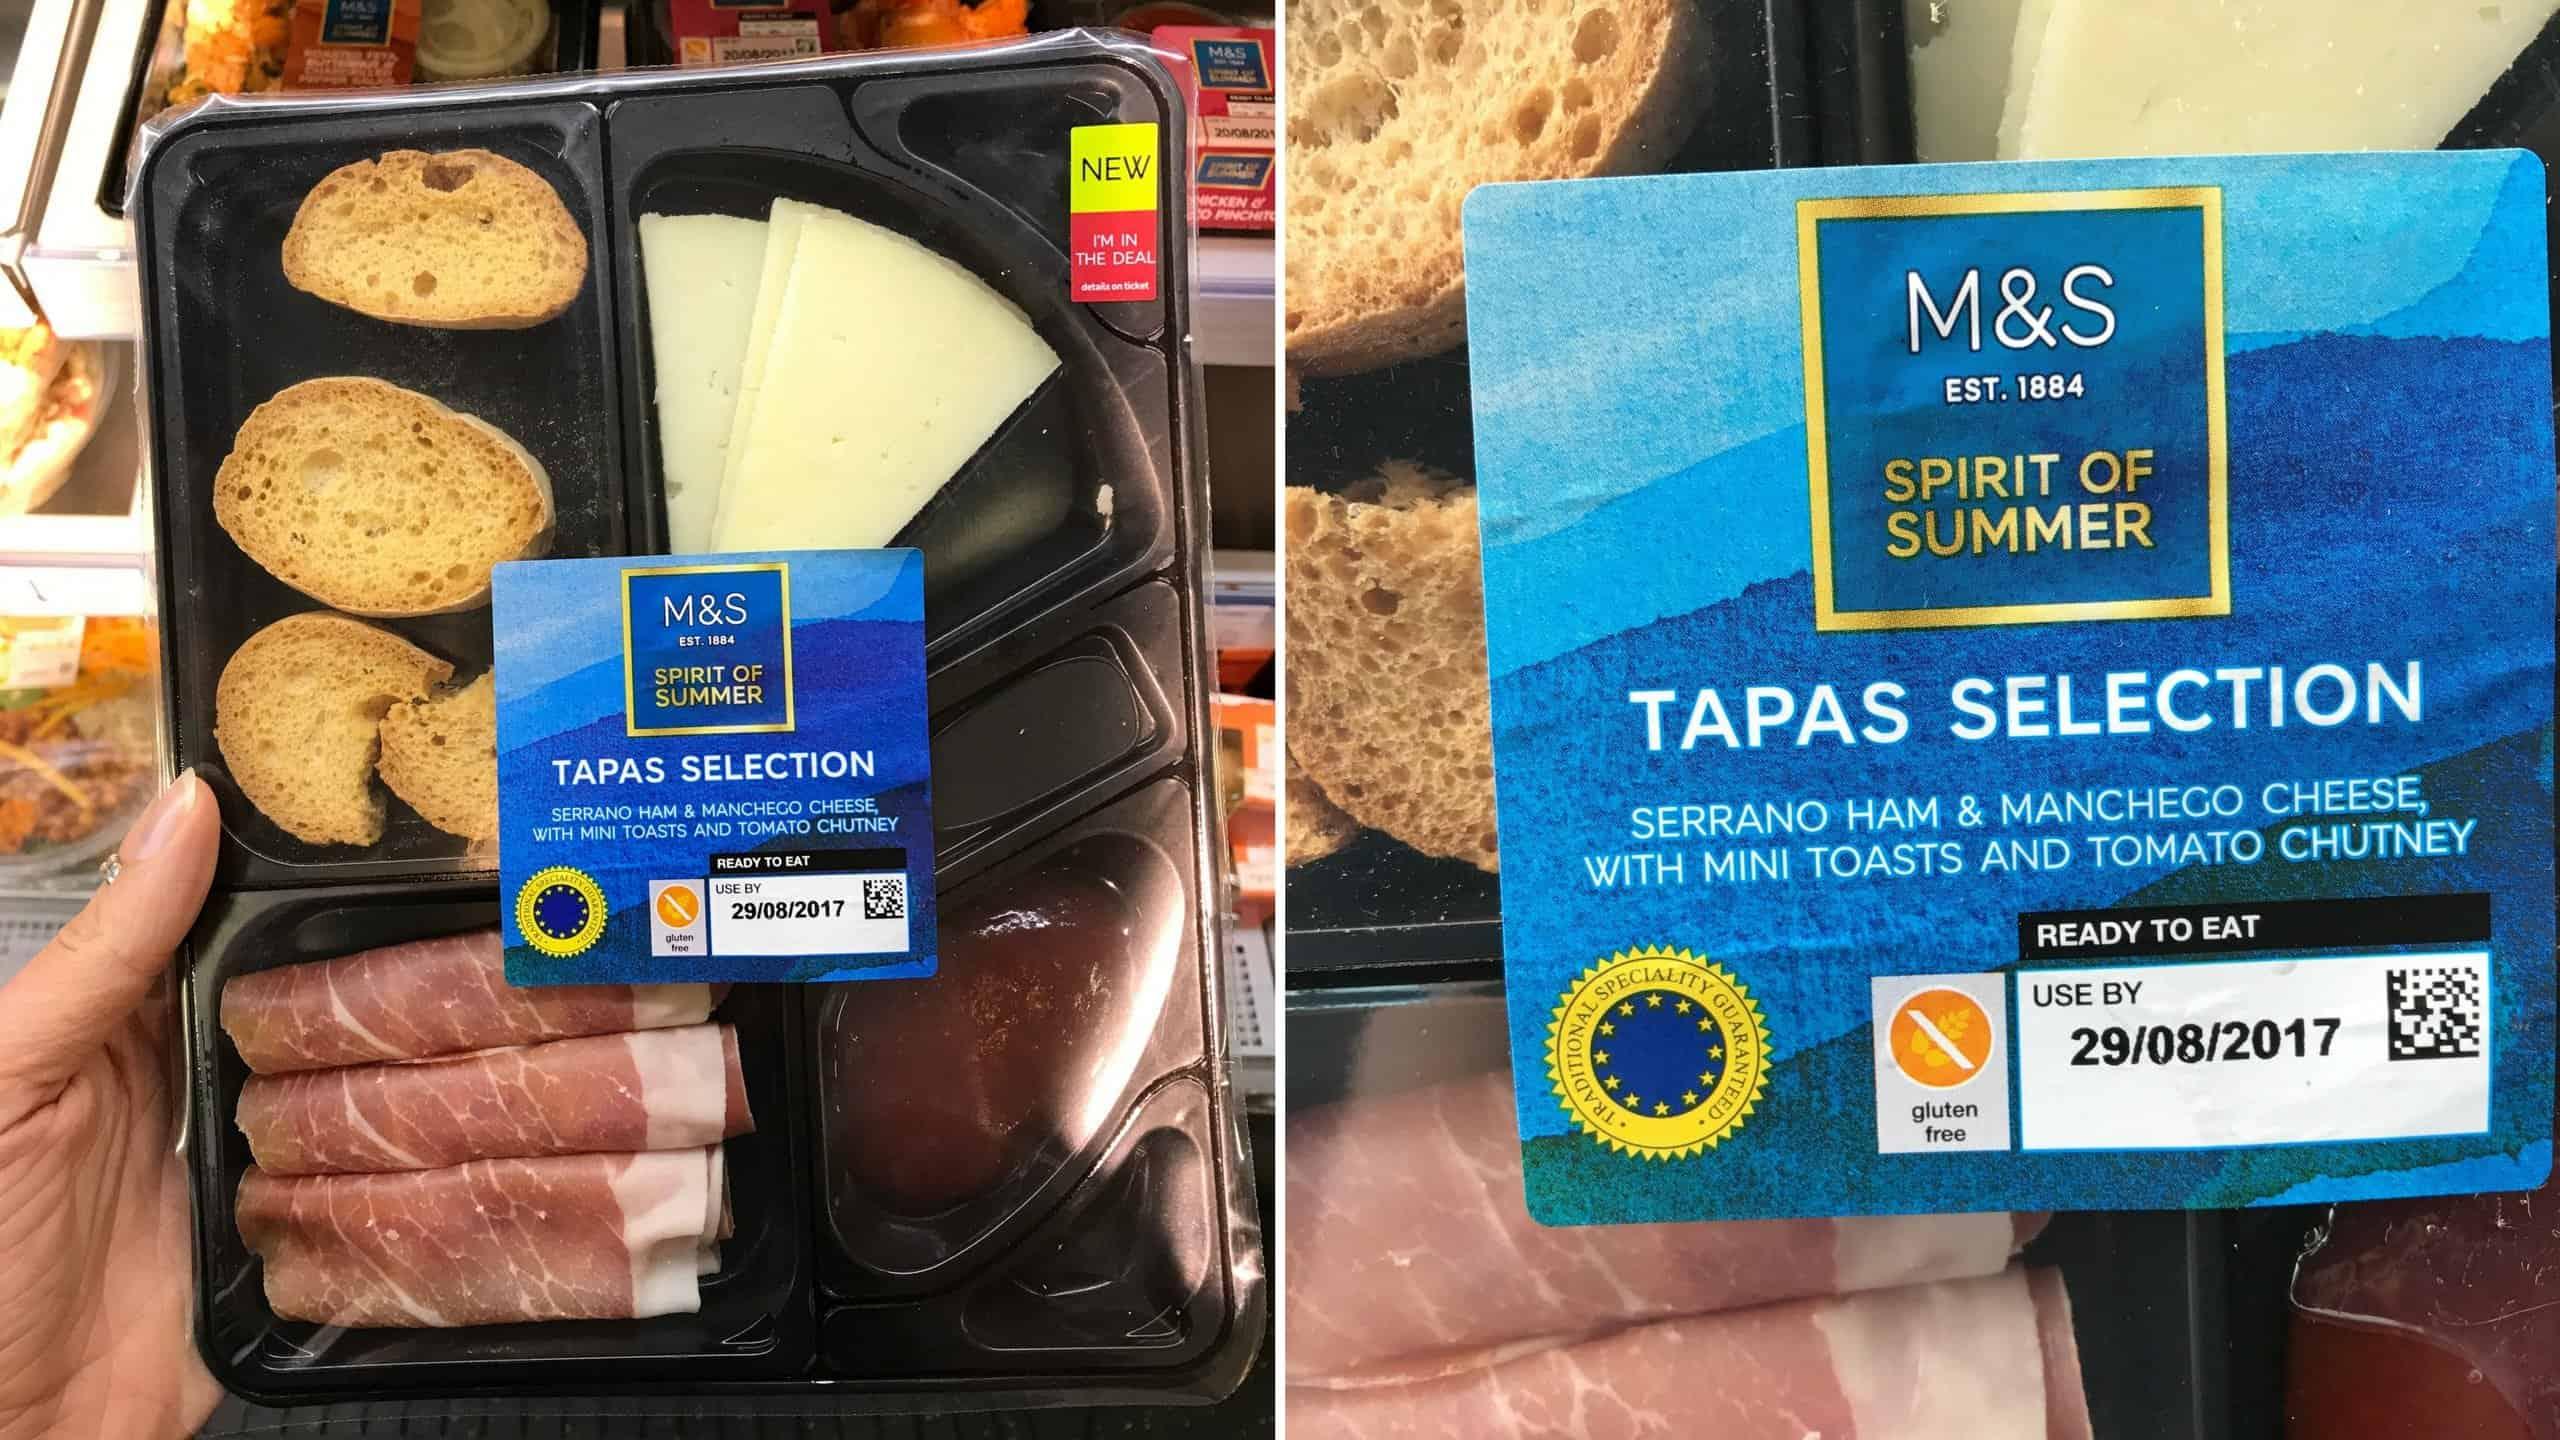 gluten free M&S tapas